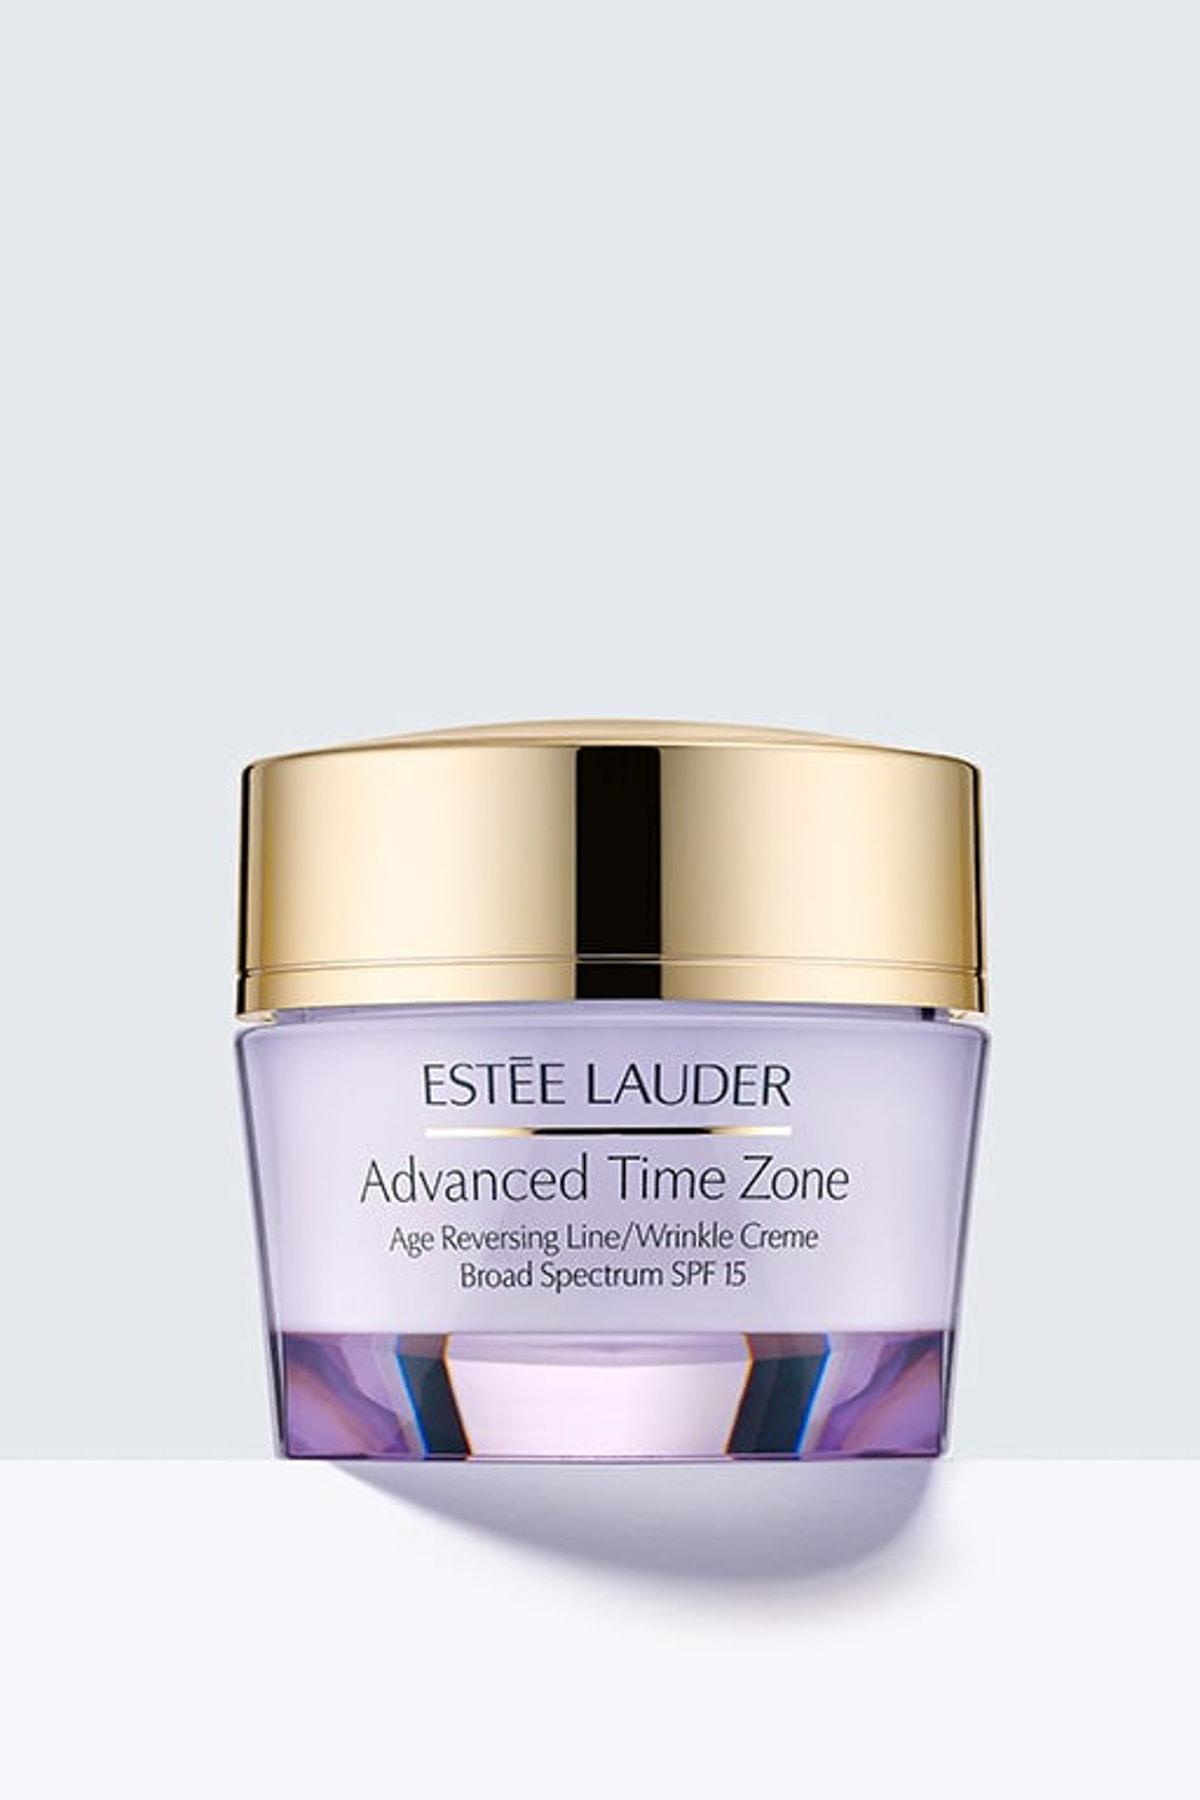 Estee Lauder Yaşlanma Karşıtı Krem - Advanced Time Zone N/c Spf 15 50 Ml 027131937128 1